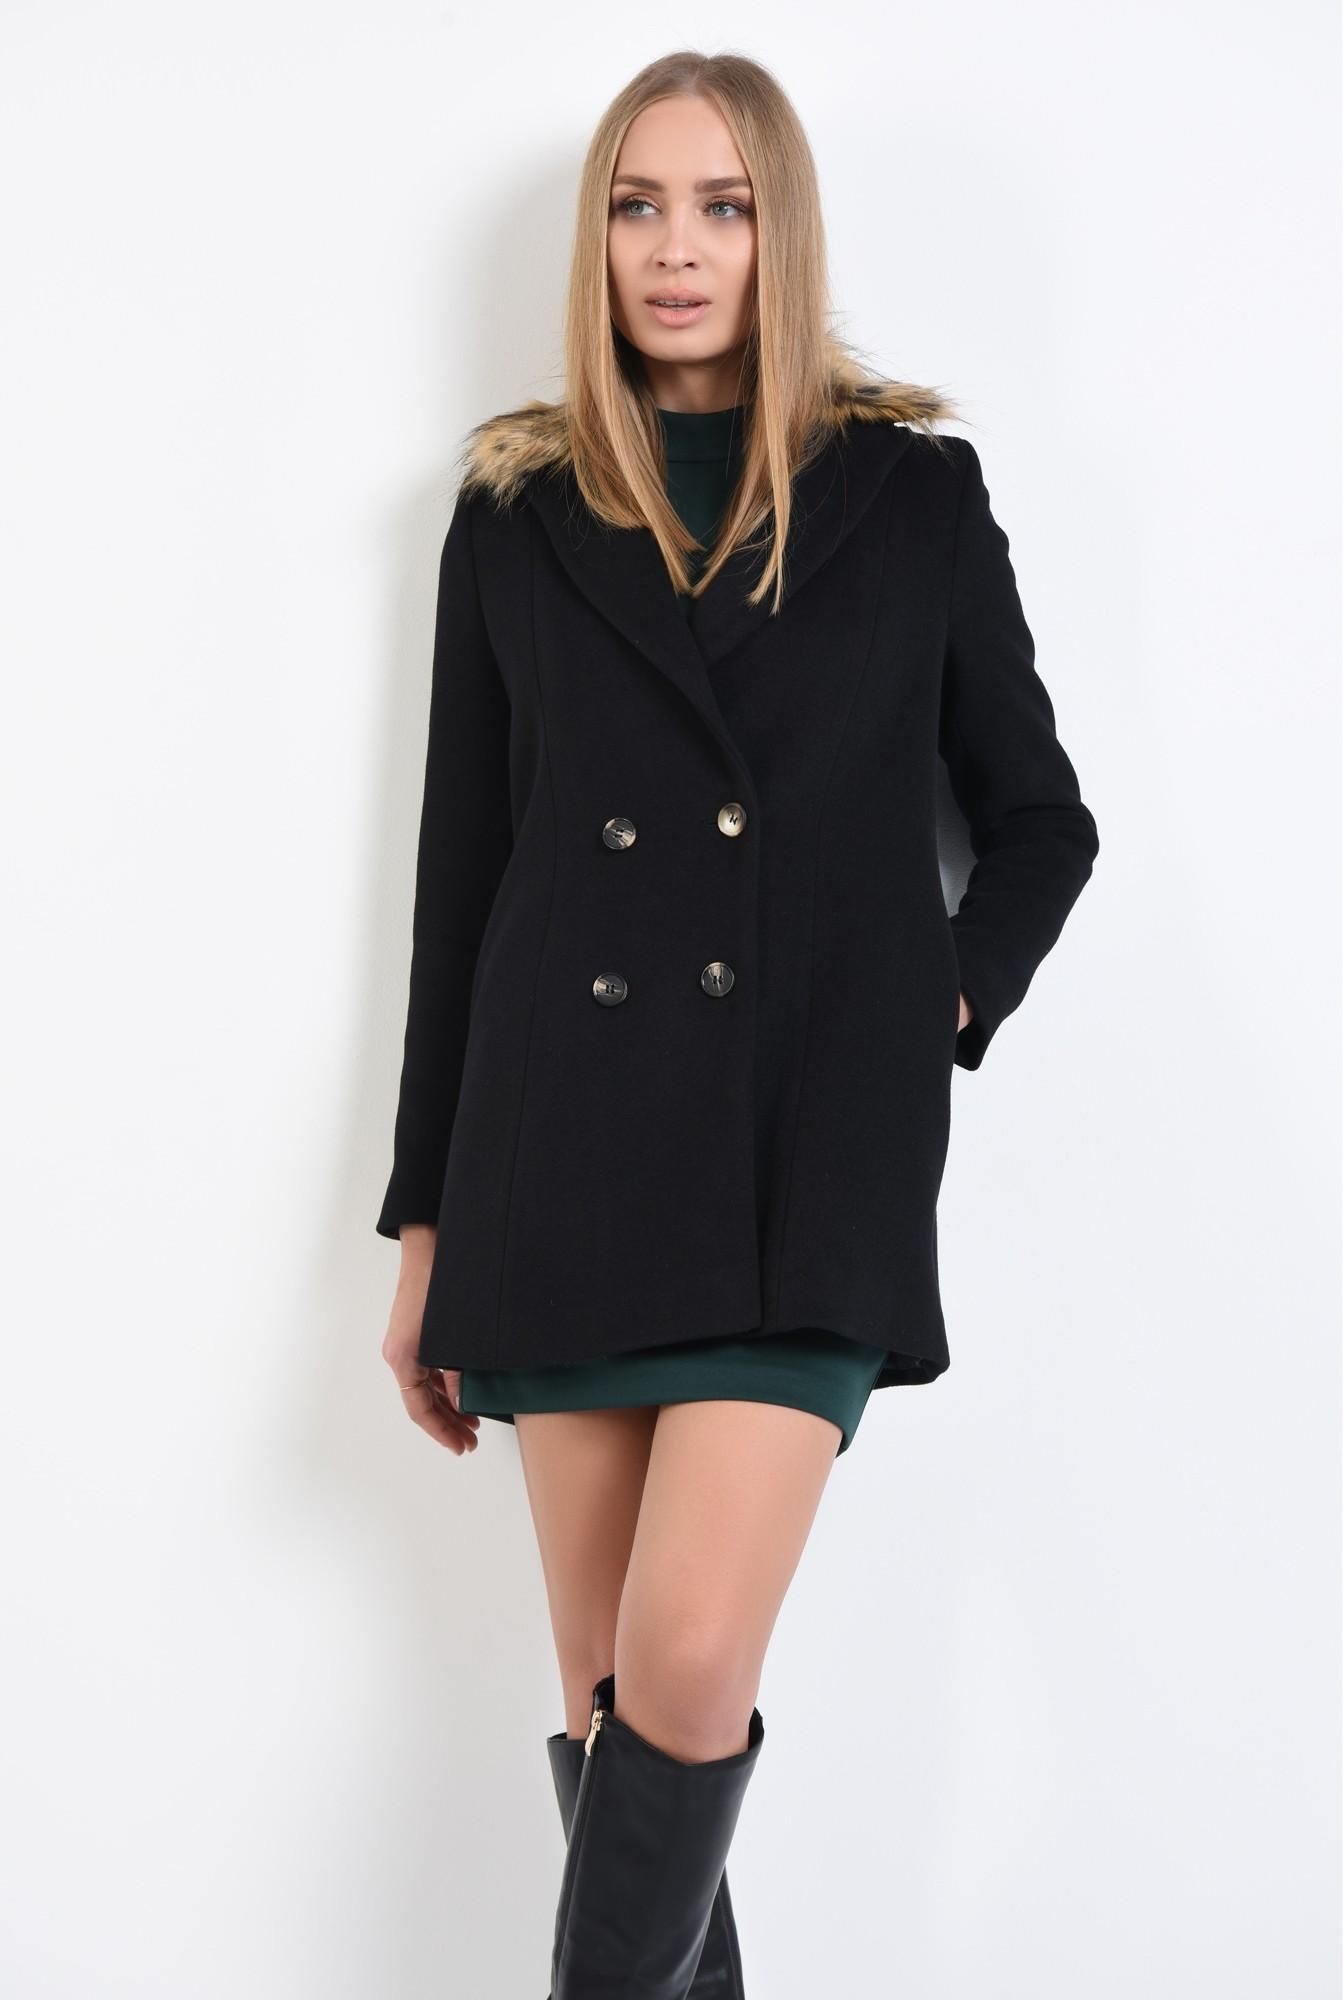 0 - 360 - palton negru, croi drept, nasturi, guler detasabil